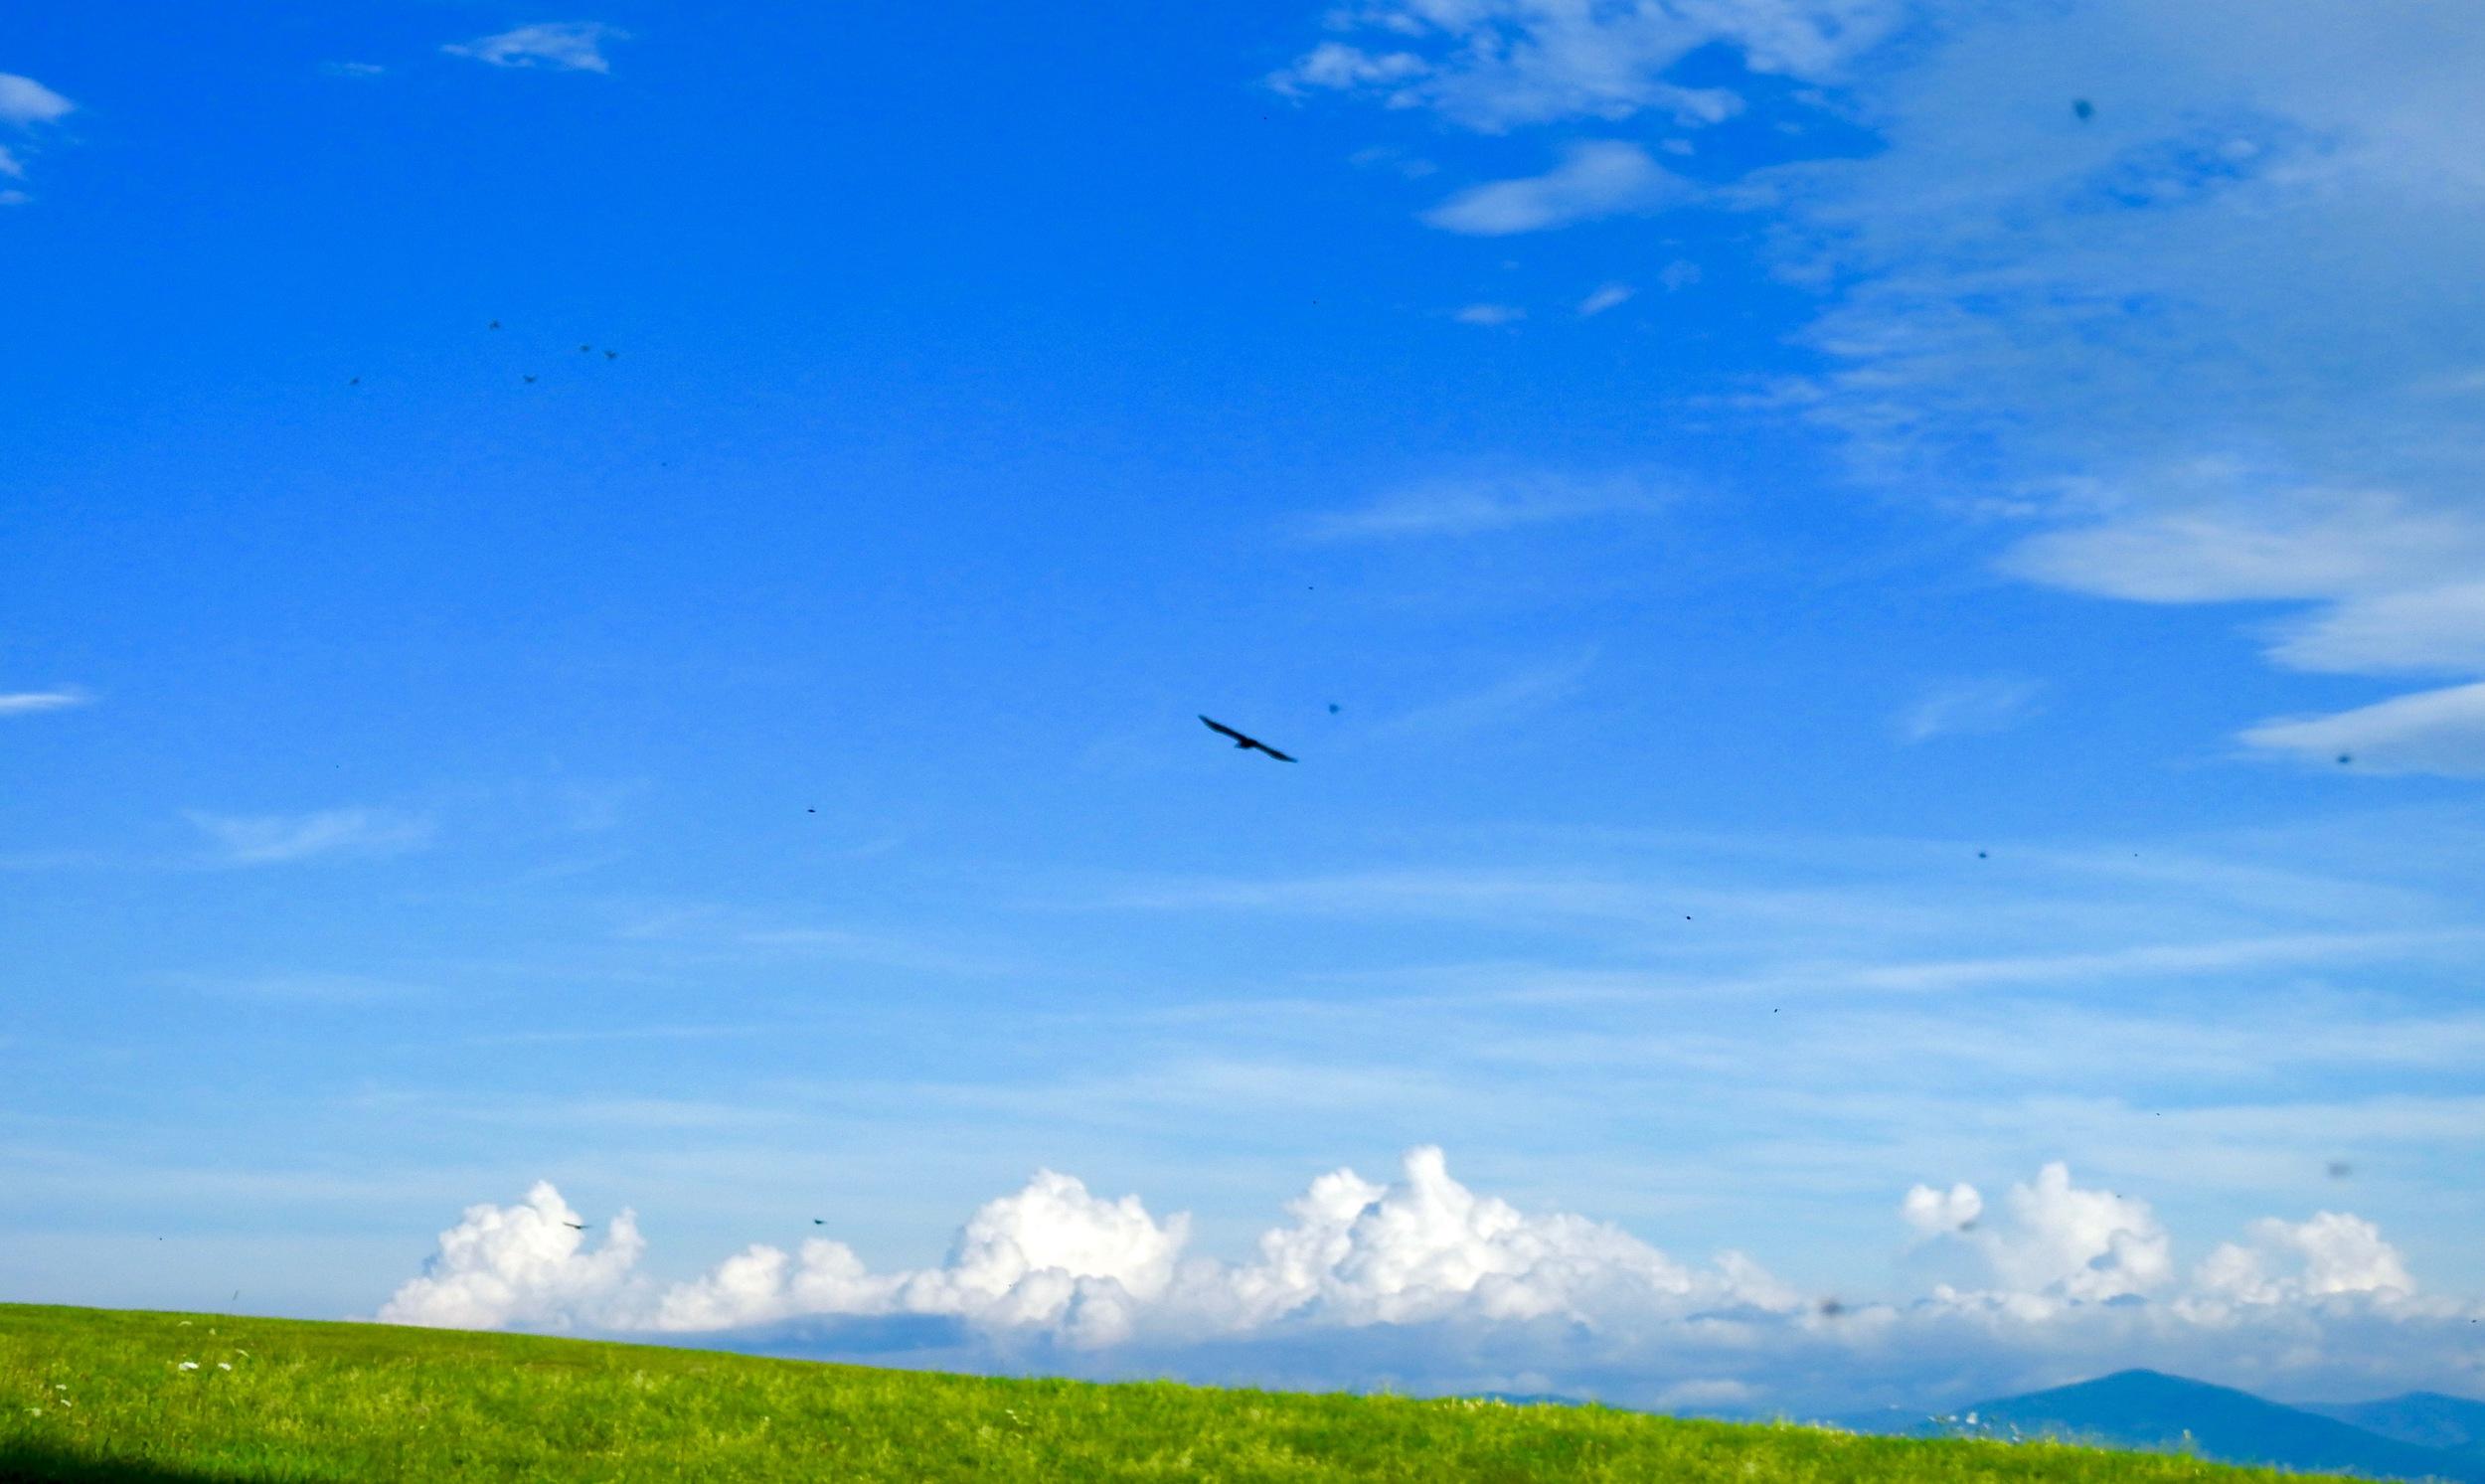 flyingsendoff